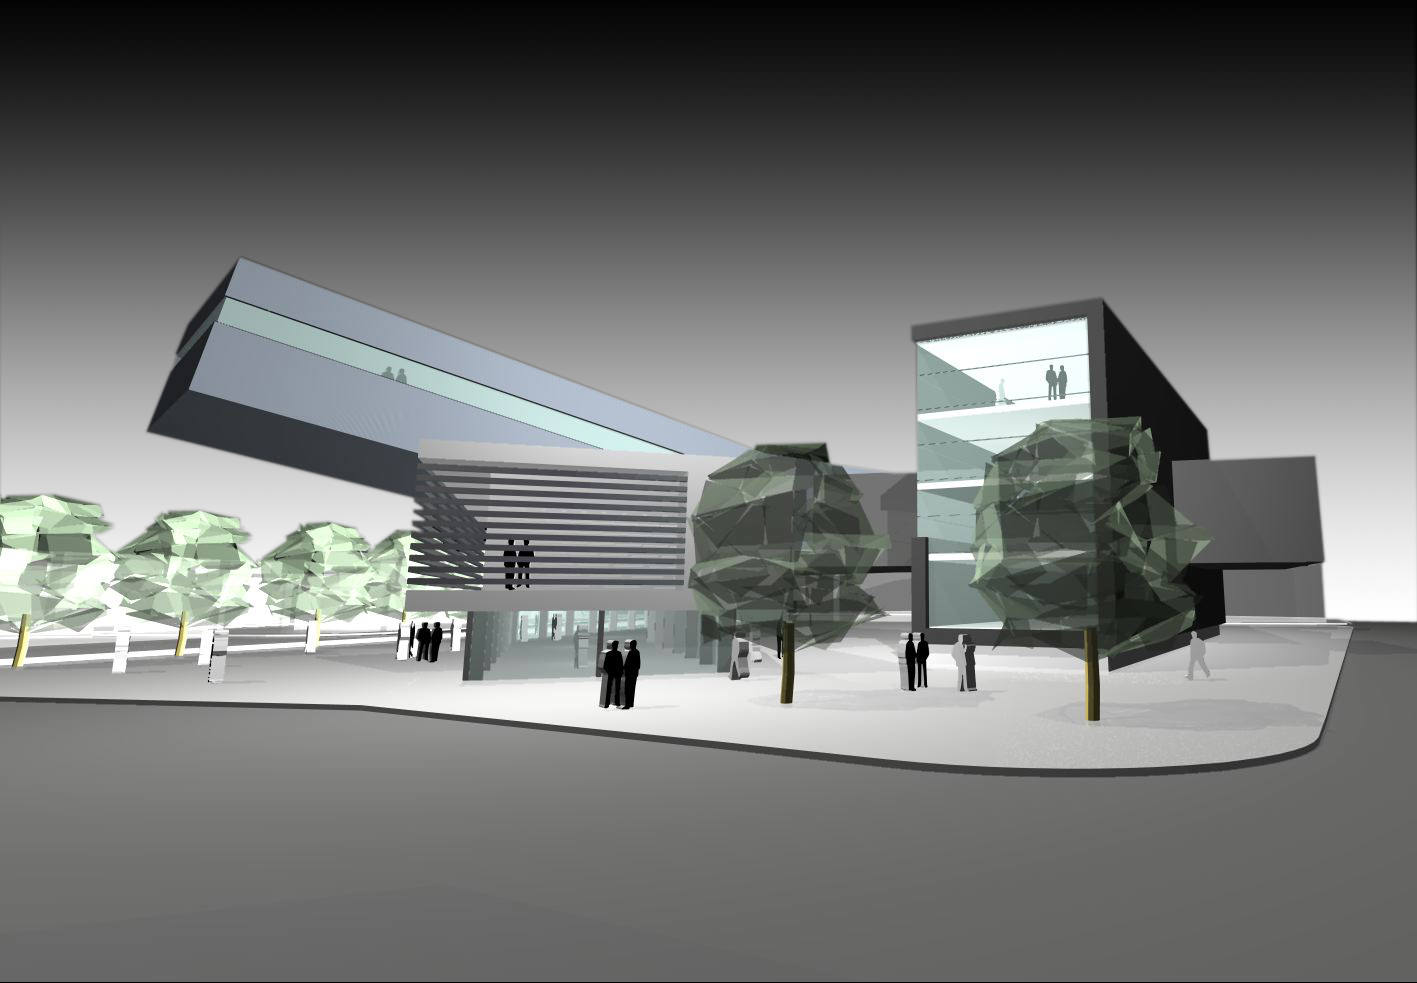 nicolas-tye-manchester-museum-8620820